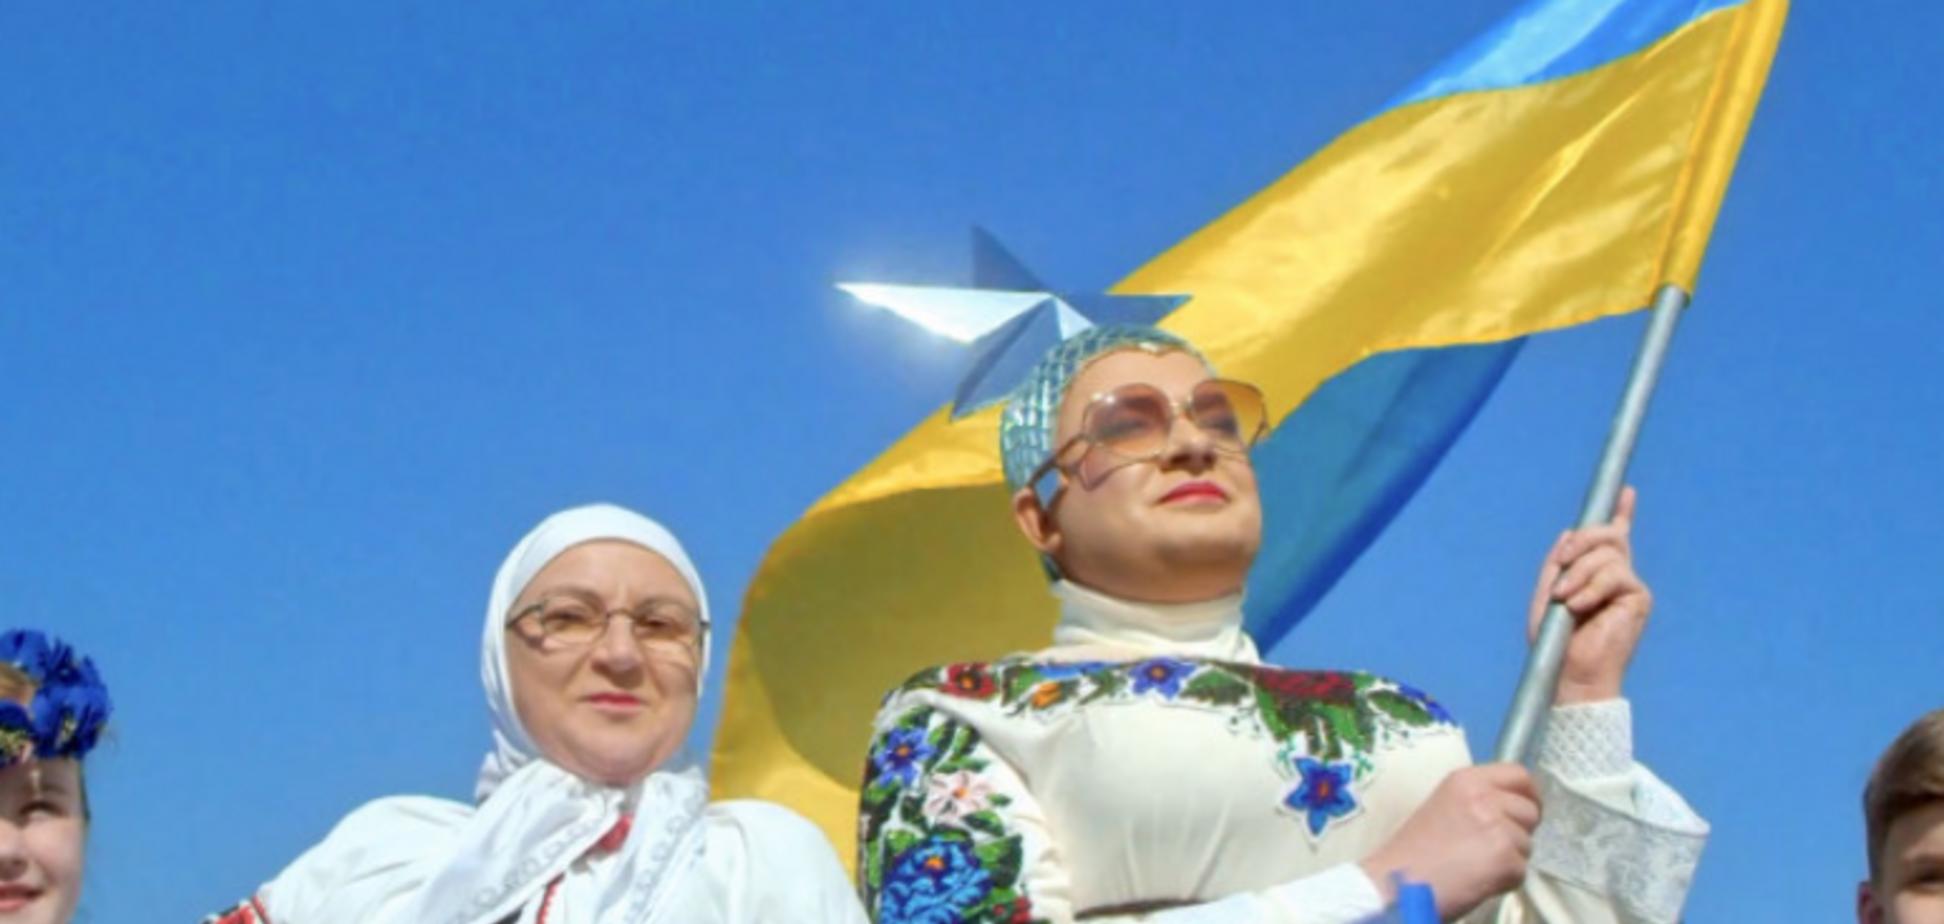 Верка Сердючка (Андрей Данилко)